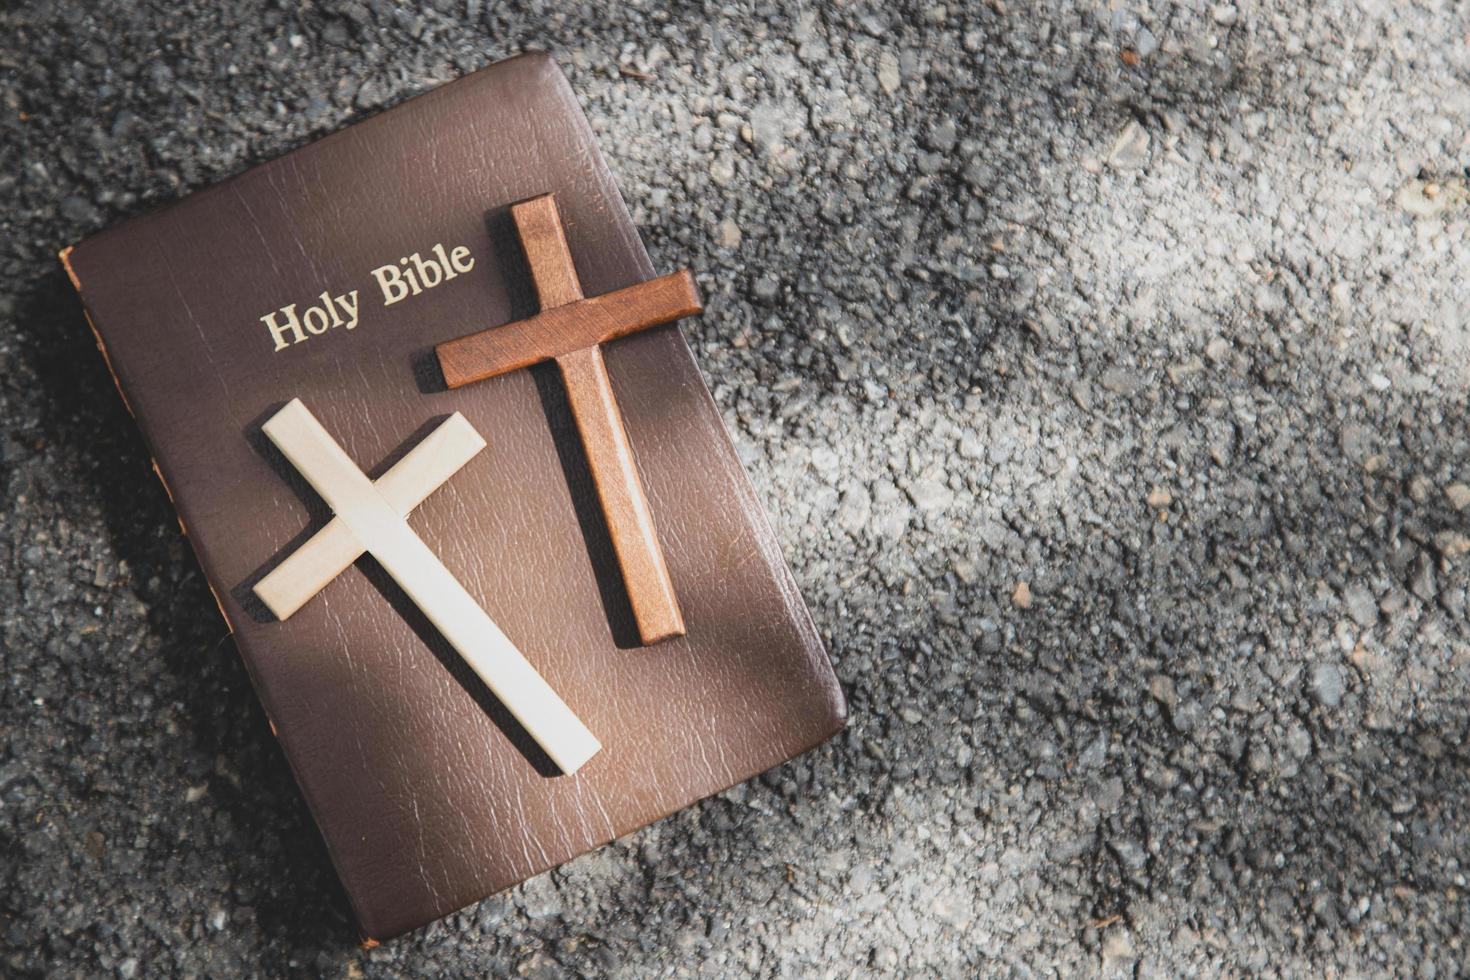 Cerca de simples cruces cristianas de madera en una Biblia foto